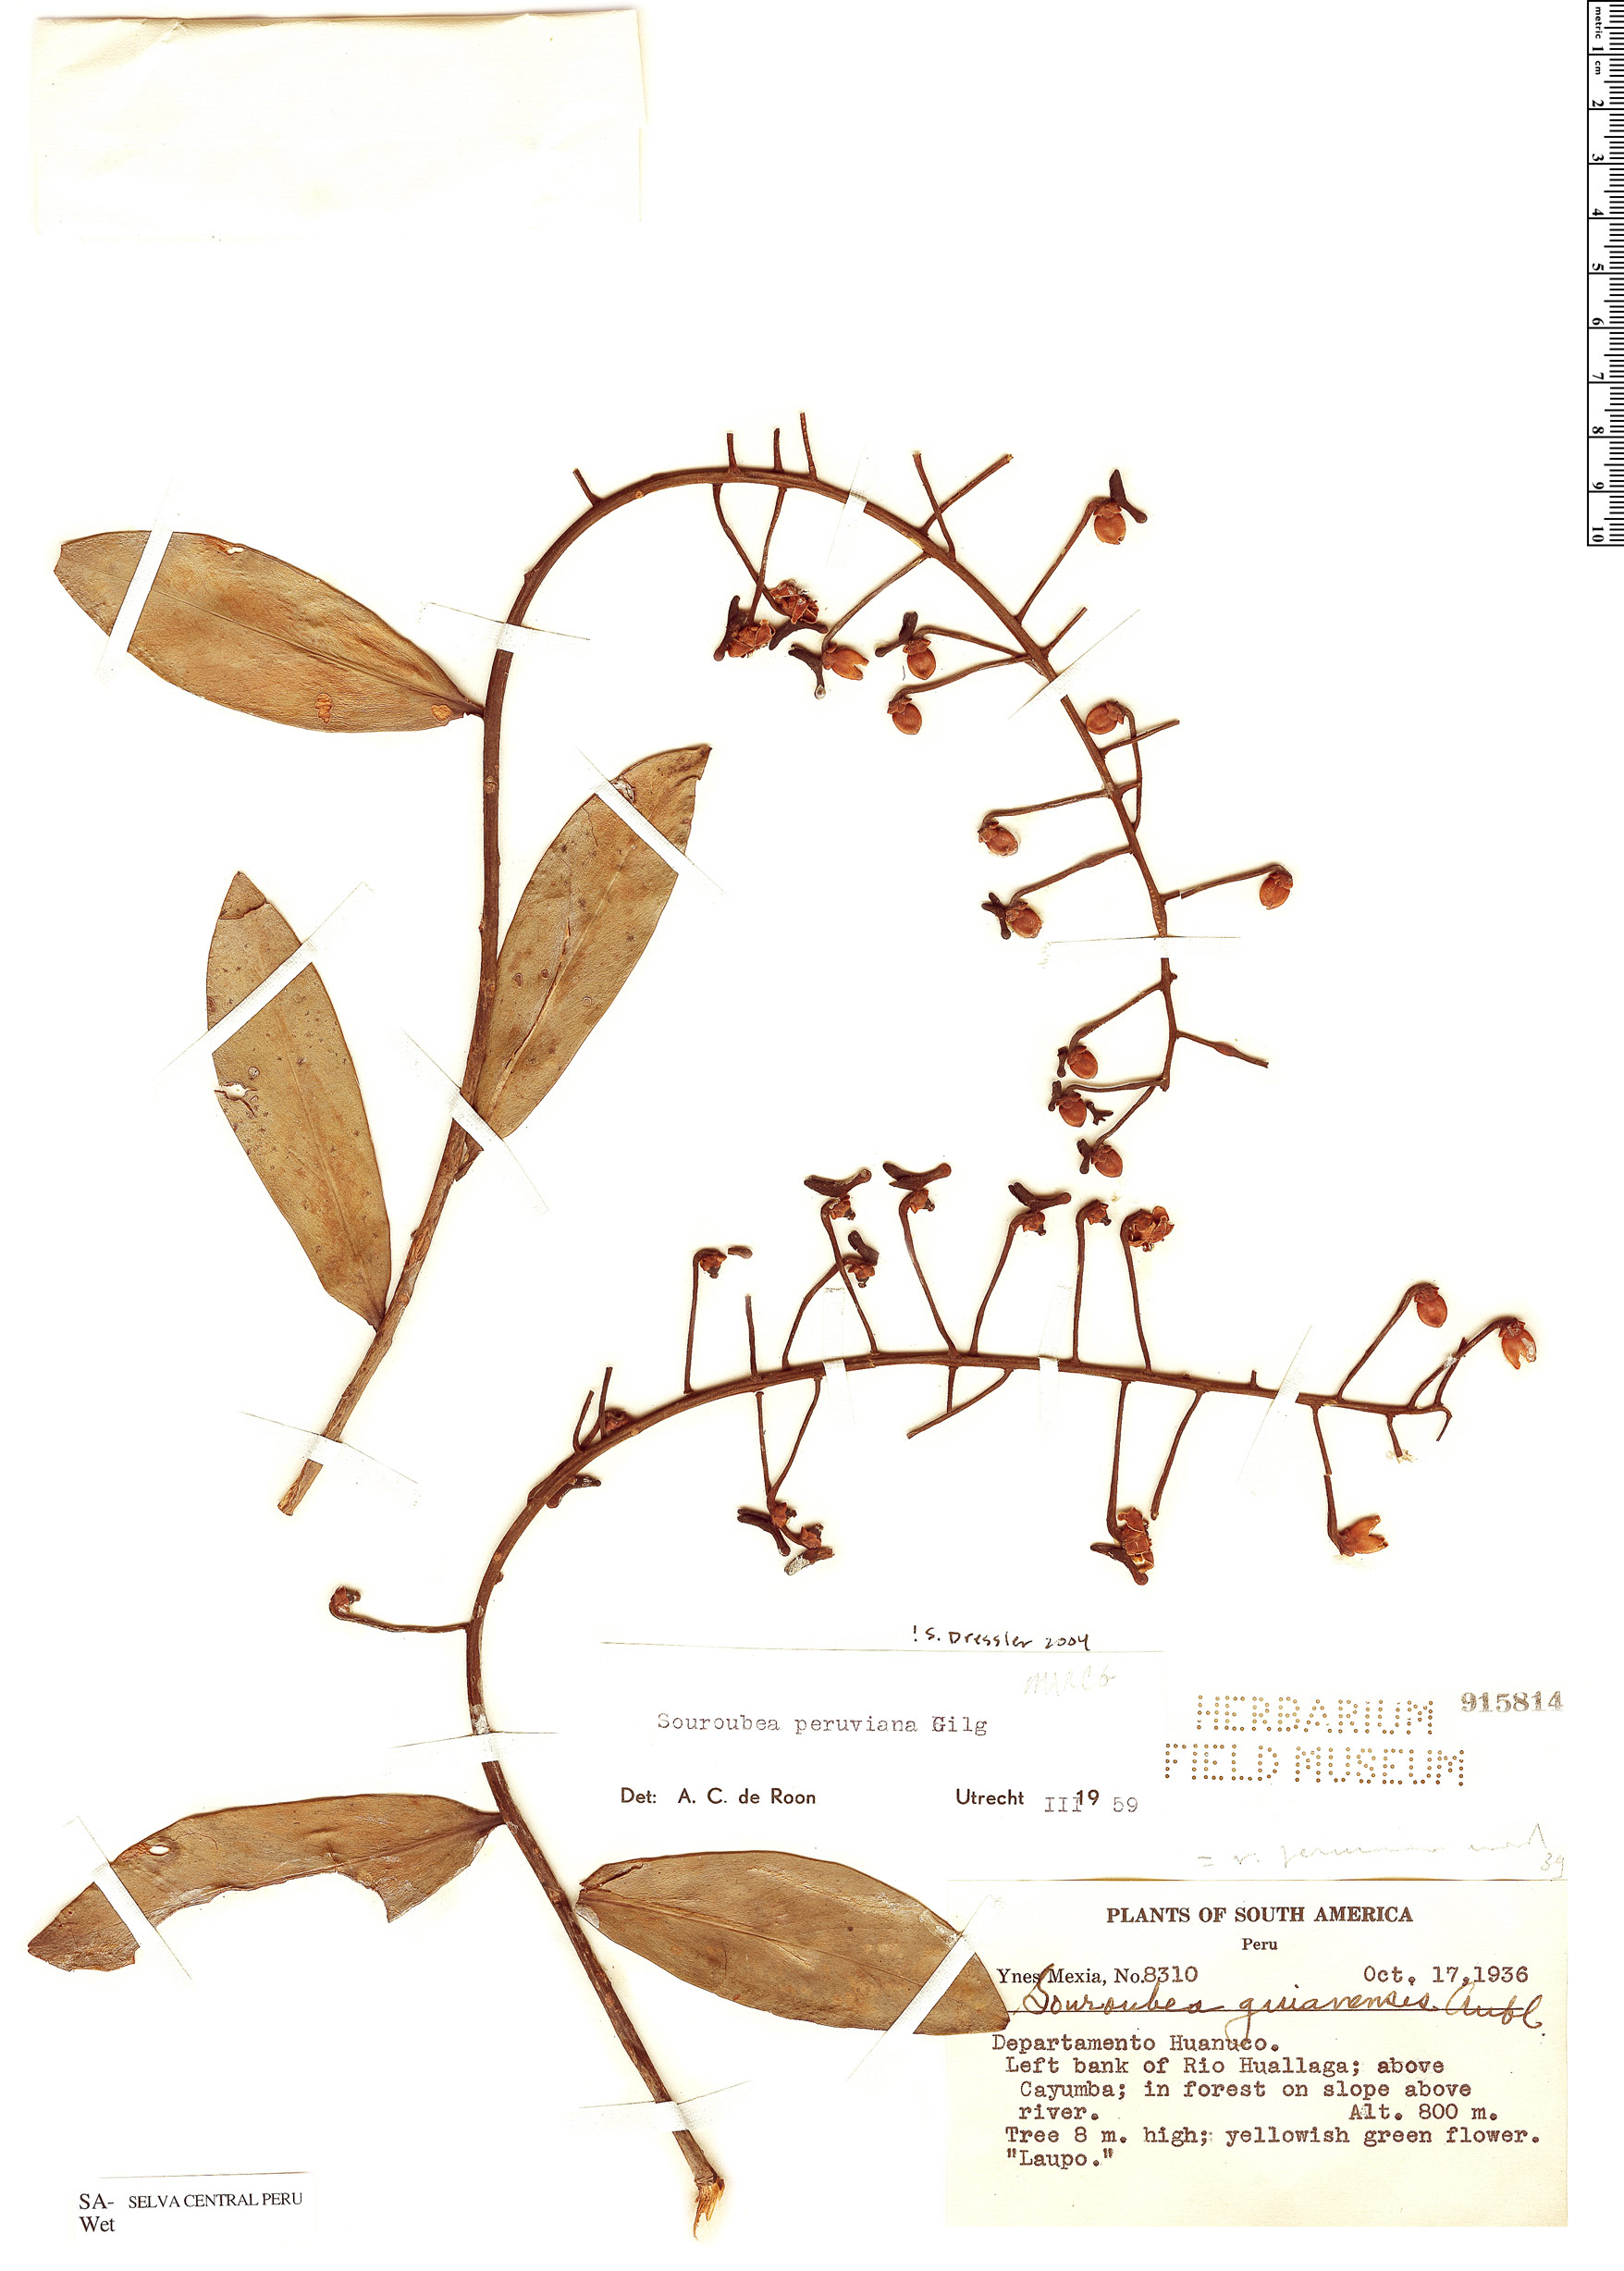 Specimen: Souroubea peruviana